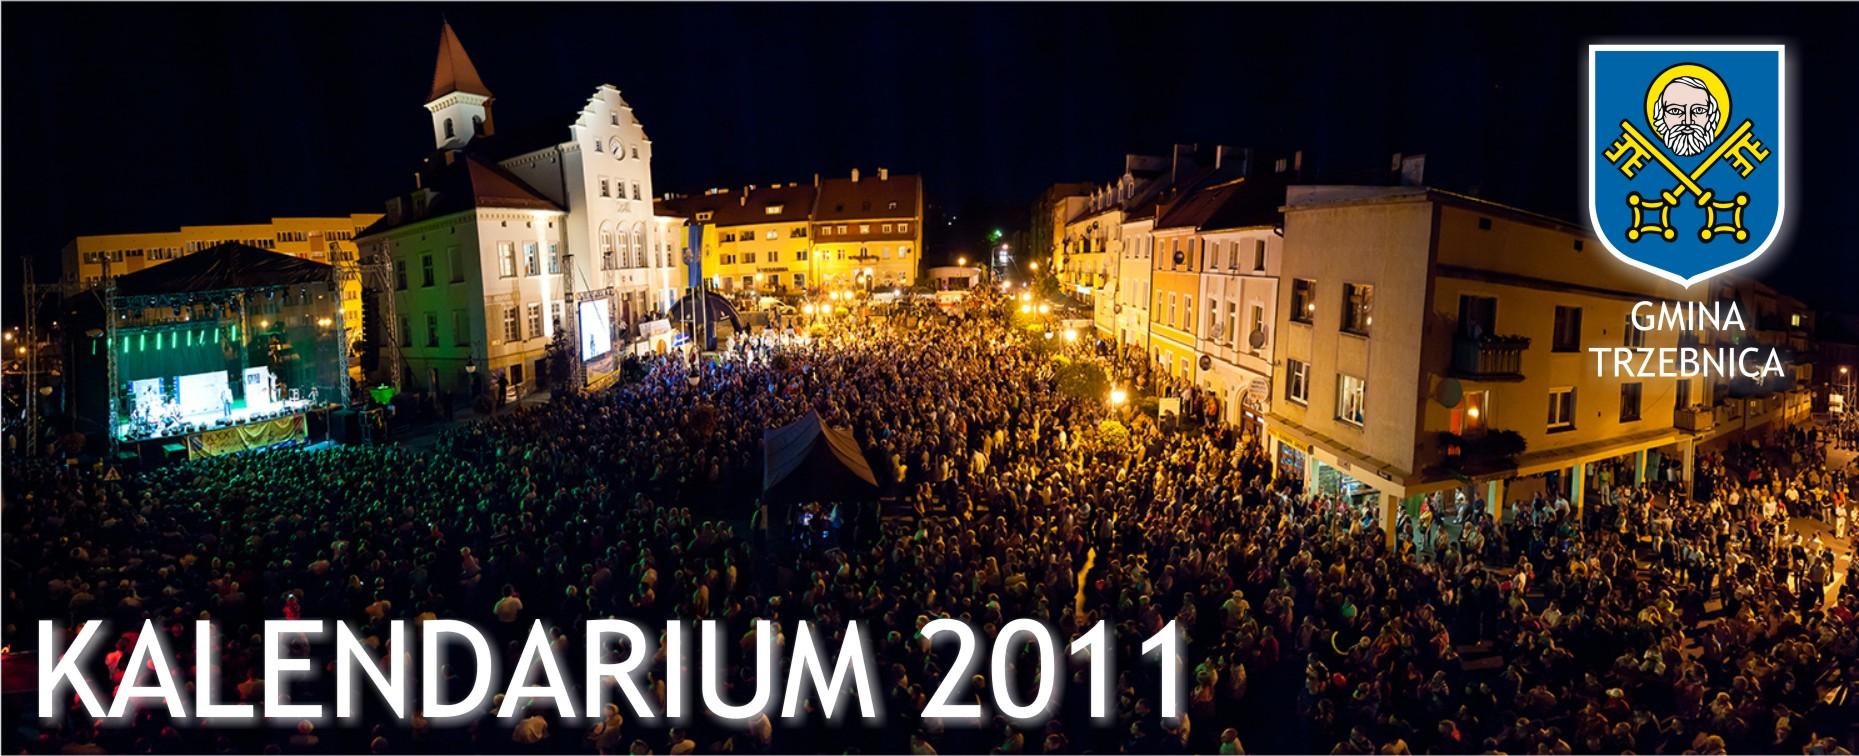 kalendarium2011.jpeg